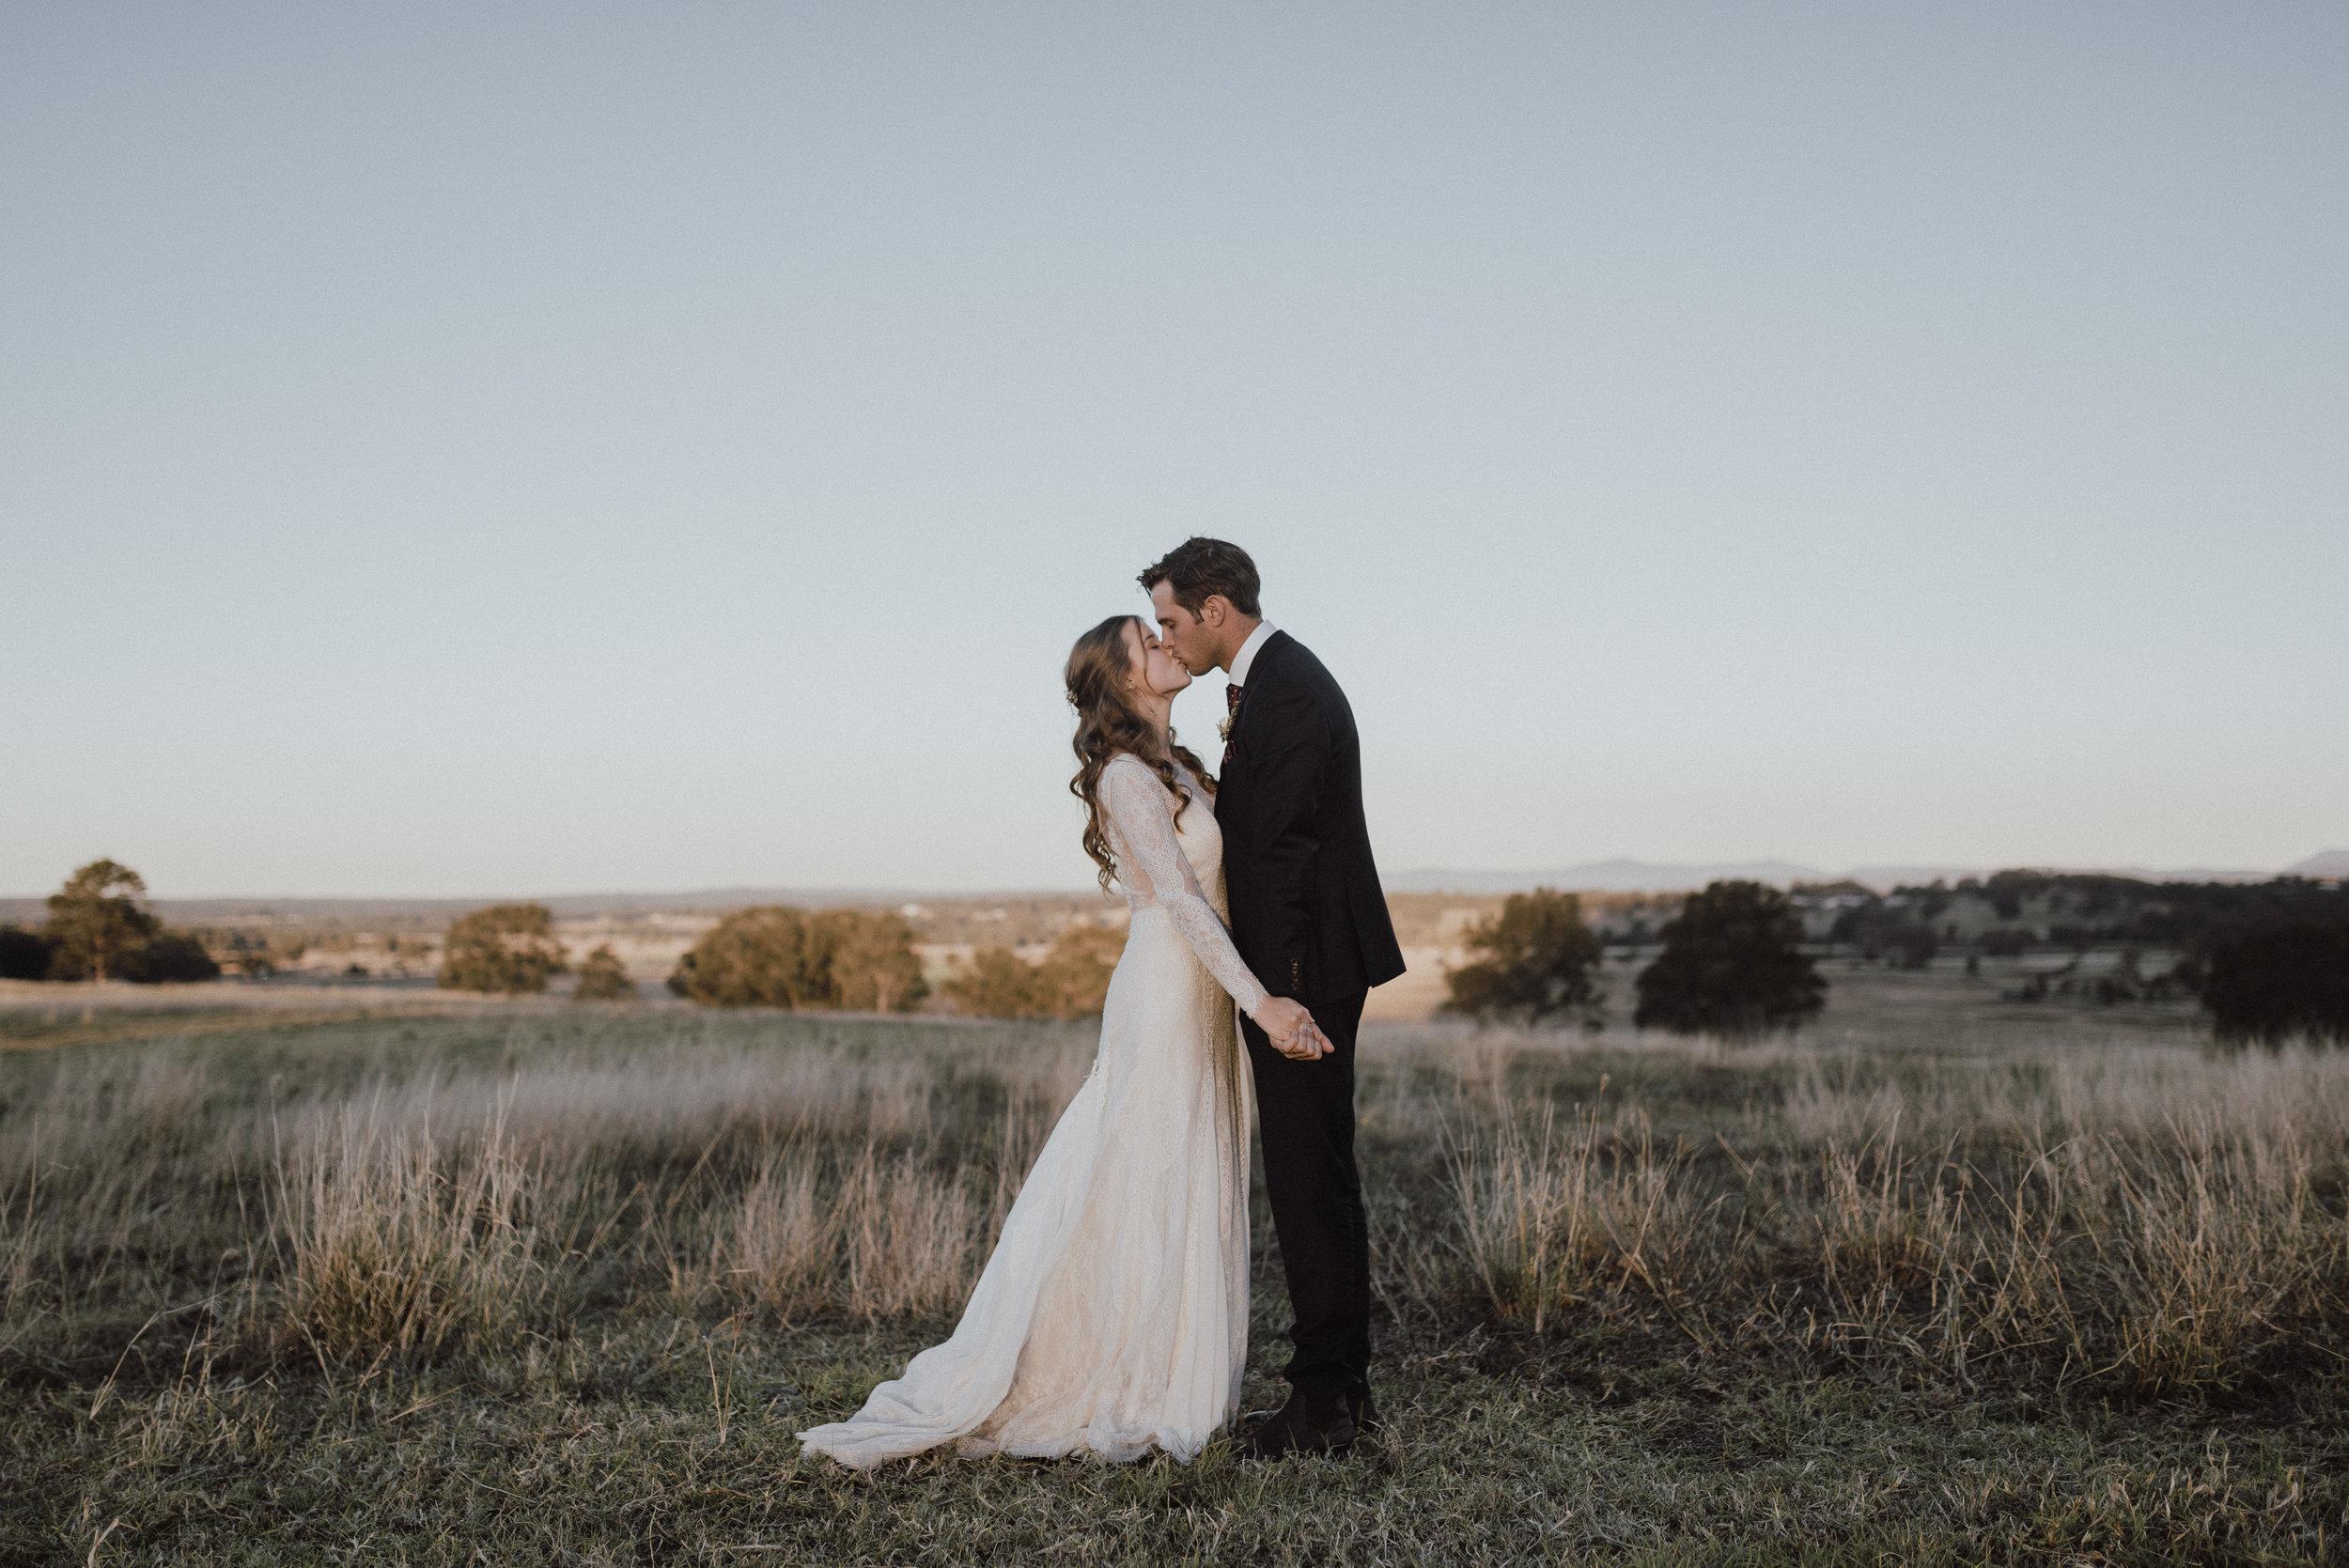 harleigh-callan-wedding-hunter-valley-pokolbin-hall-oliversmithphoto-sydney-wedding-photographer-318.jpg